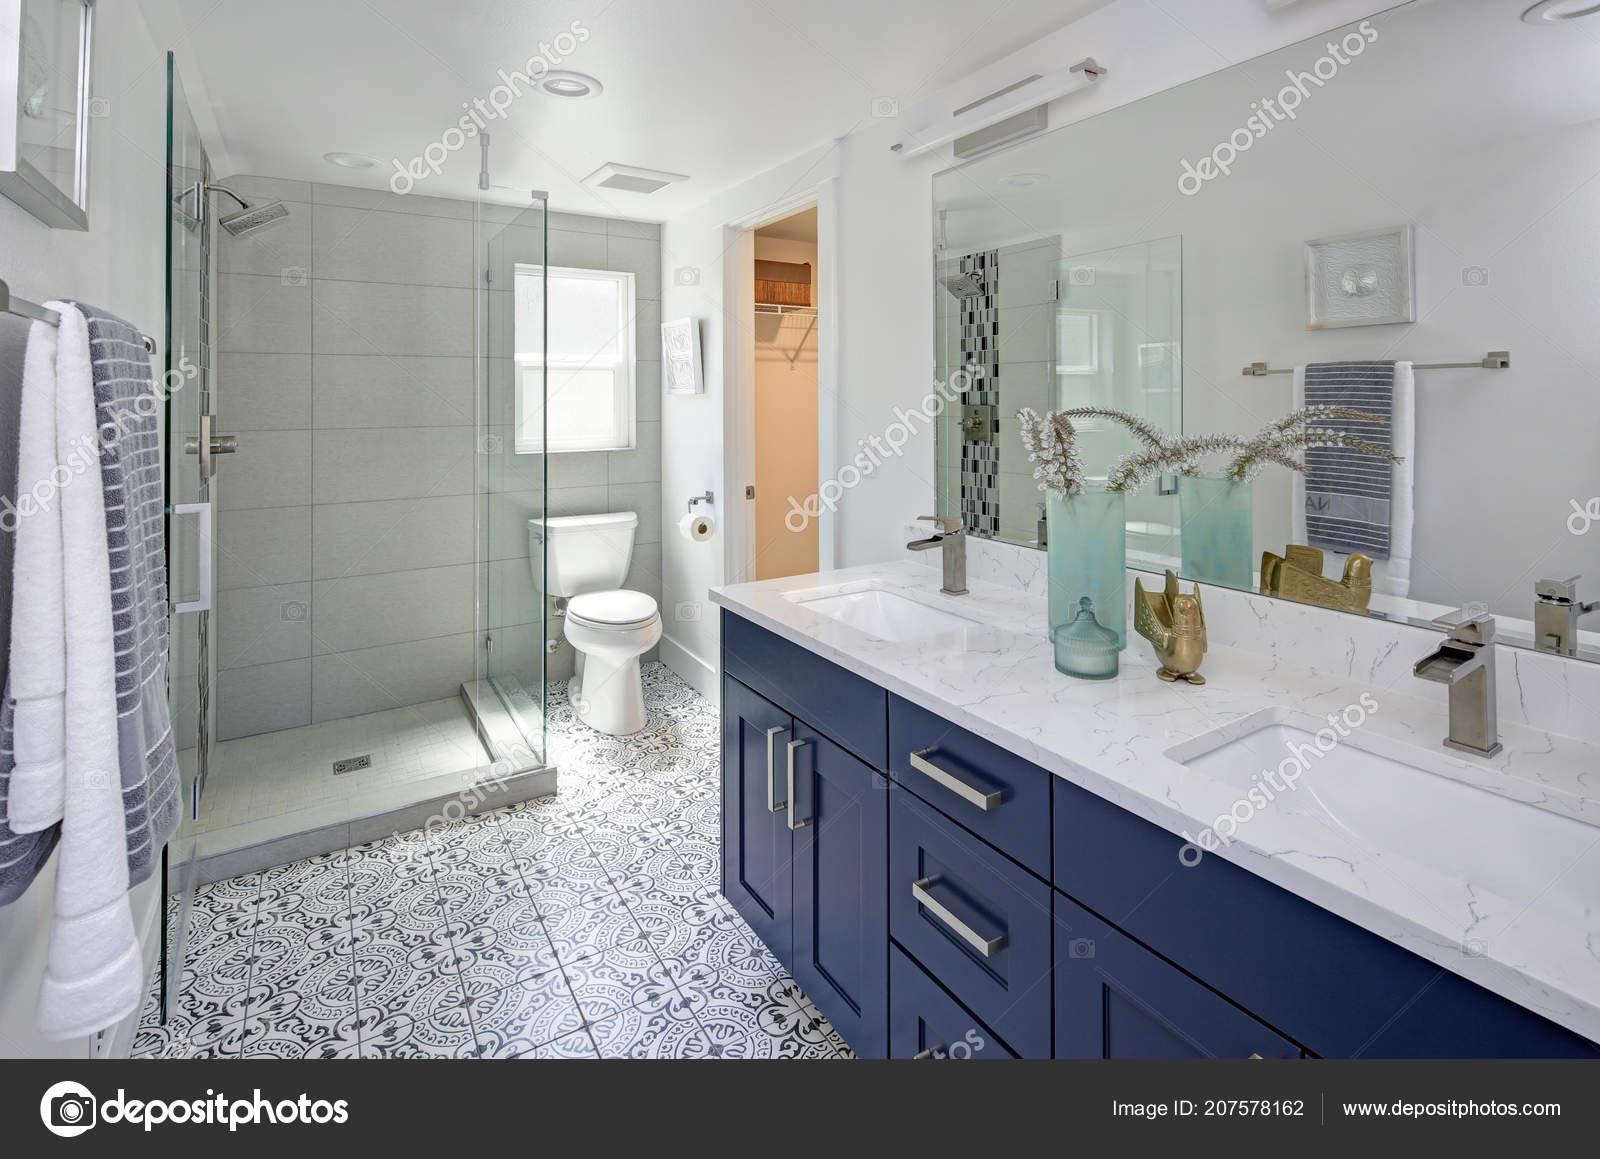 . Modern Bathroom Interior Blue Double Vanity Glass Shower   Stock